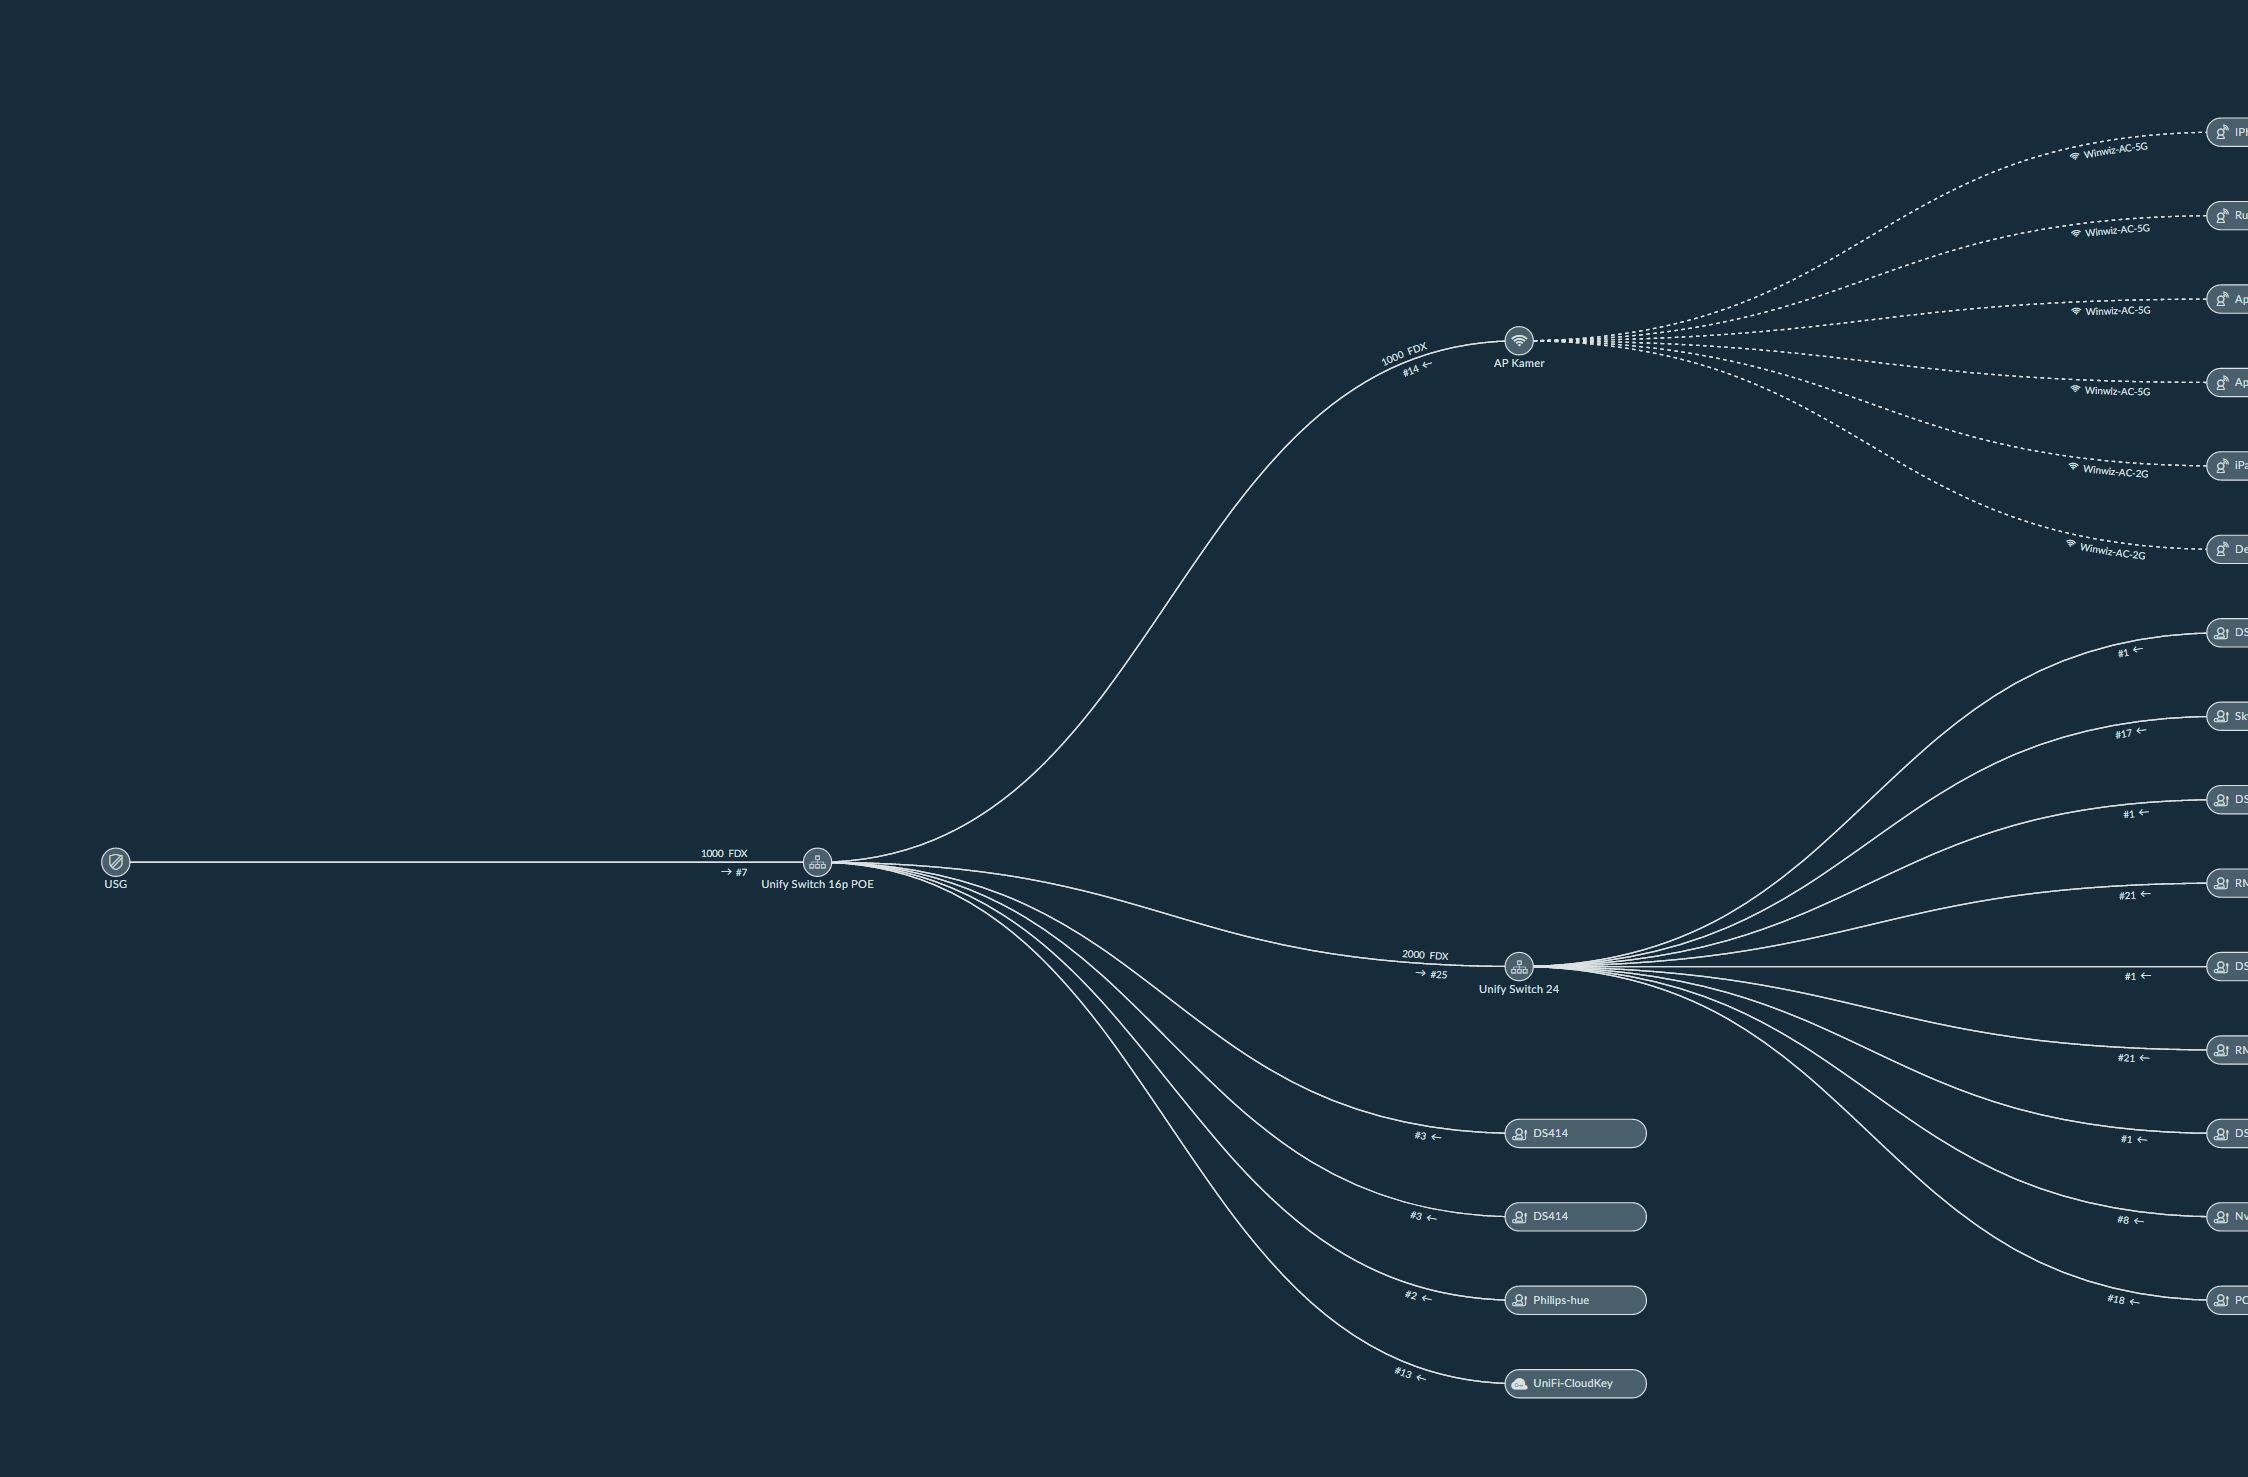 http://files.winwiz.nl/sat4all/topologie.jpg